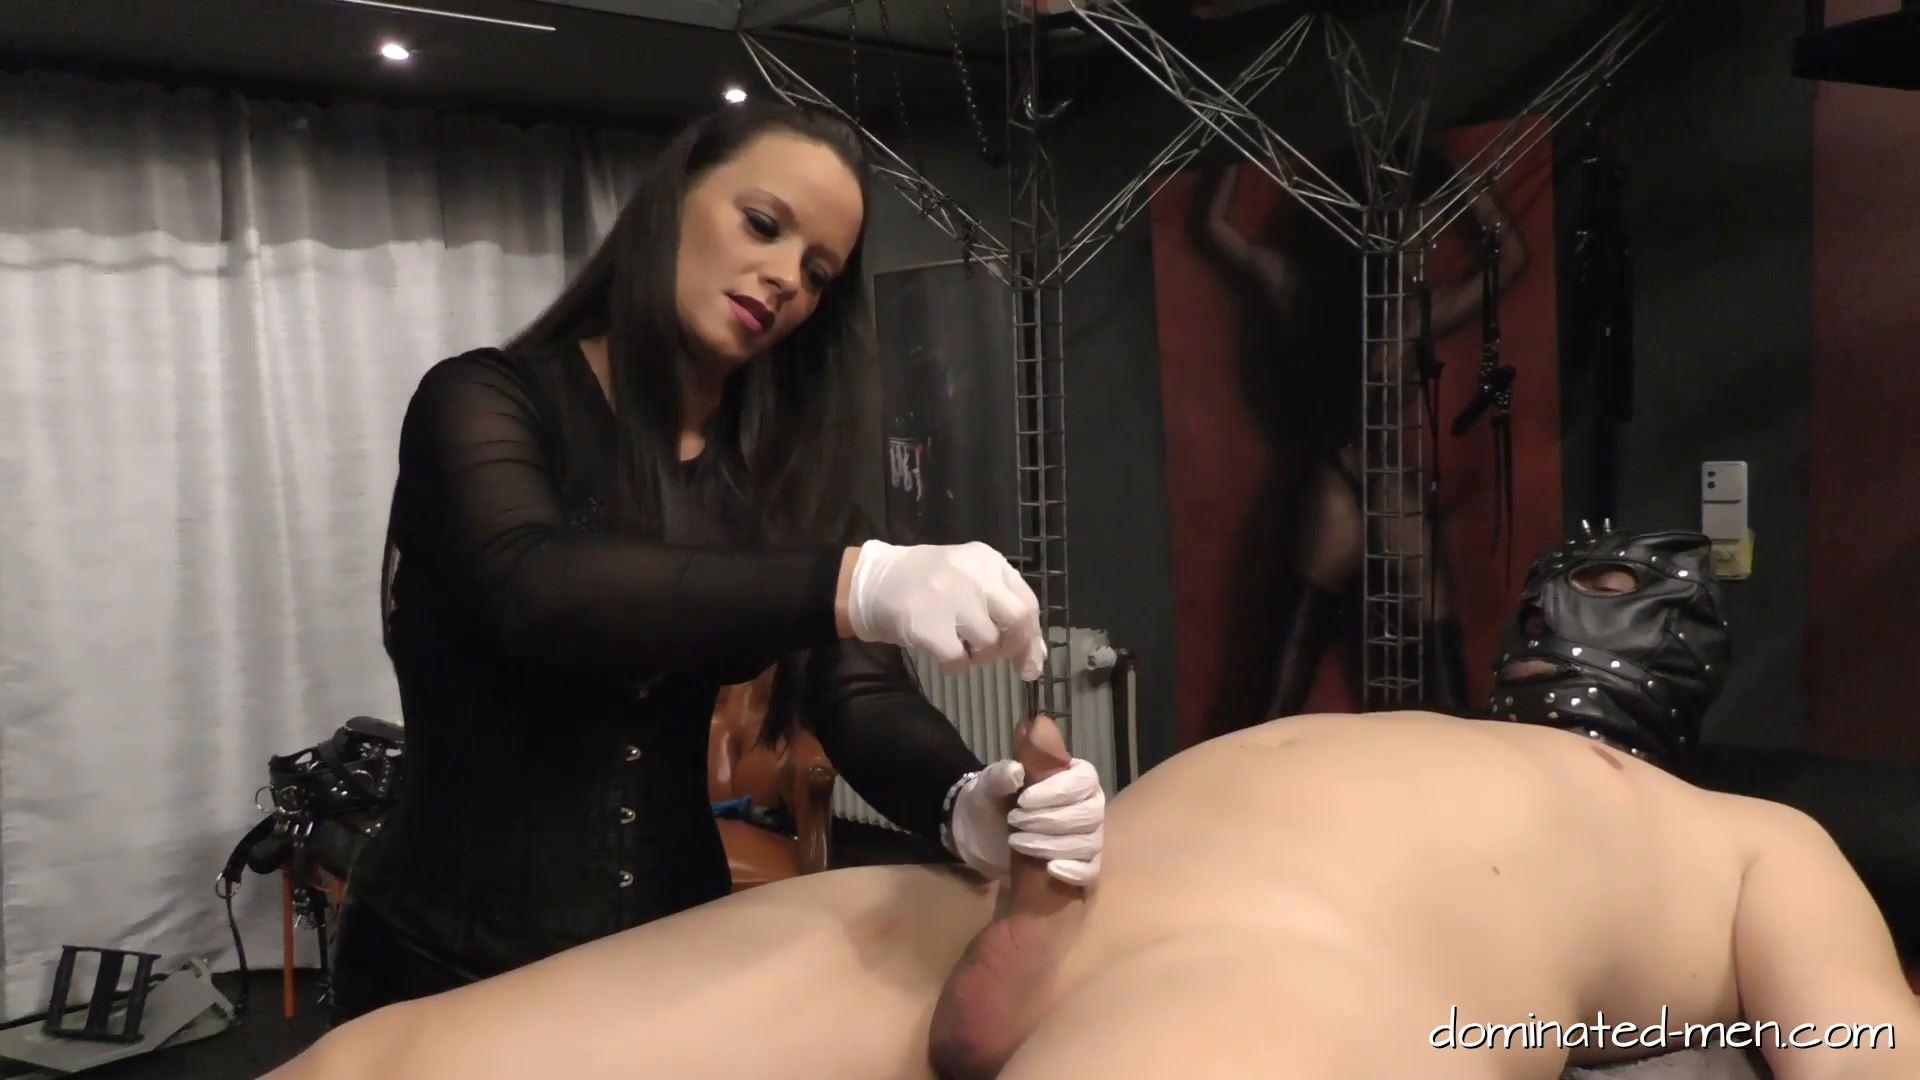 Comtesse la Moet In Scene: My Fun your Pain Part 1 - DOMINATED-MEN - FULL HD/1080p/MP4